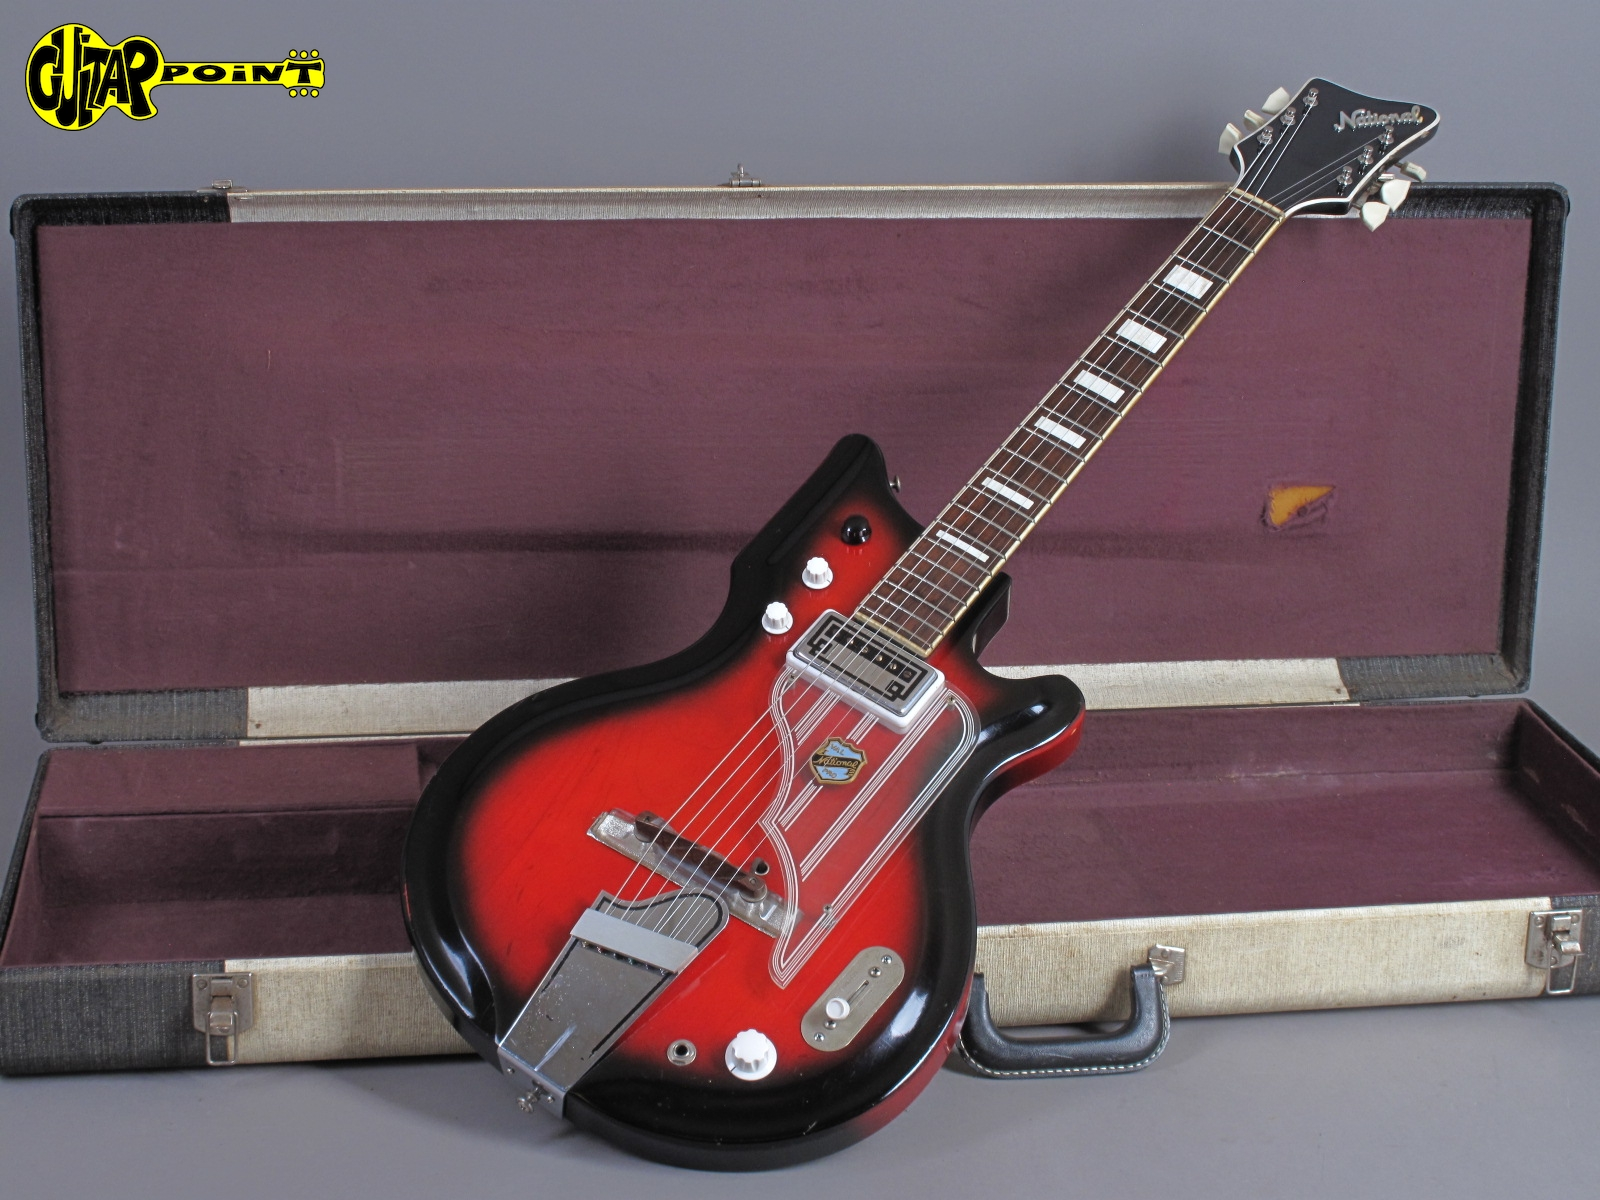 https://guitarpoint.de/app/uploads/products/1963-national-westwood-75-sunburst-made-in-usa-2/National63Westwood75x_15.jpg